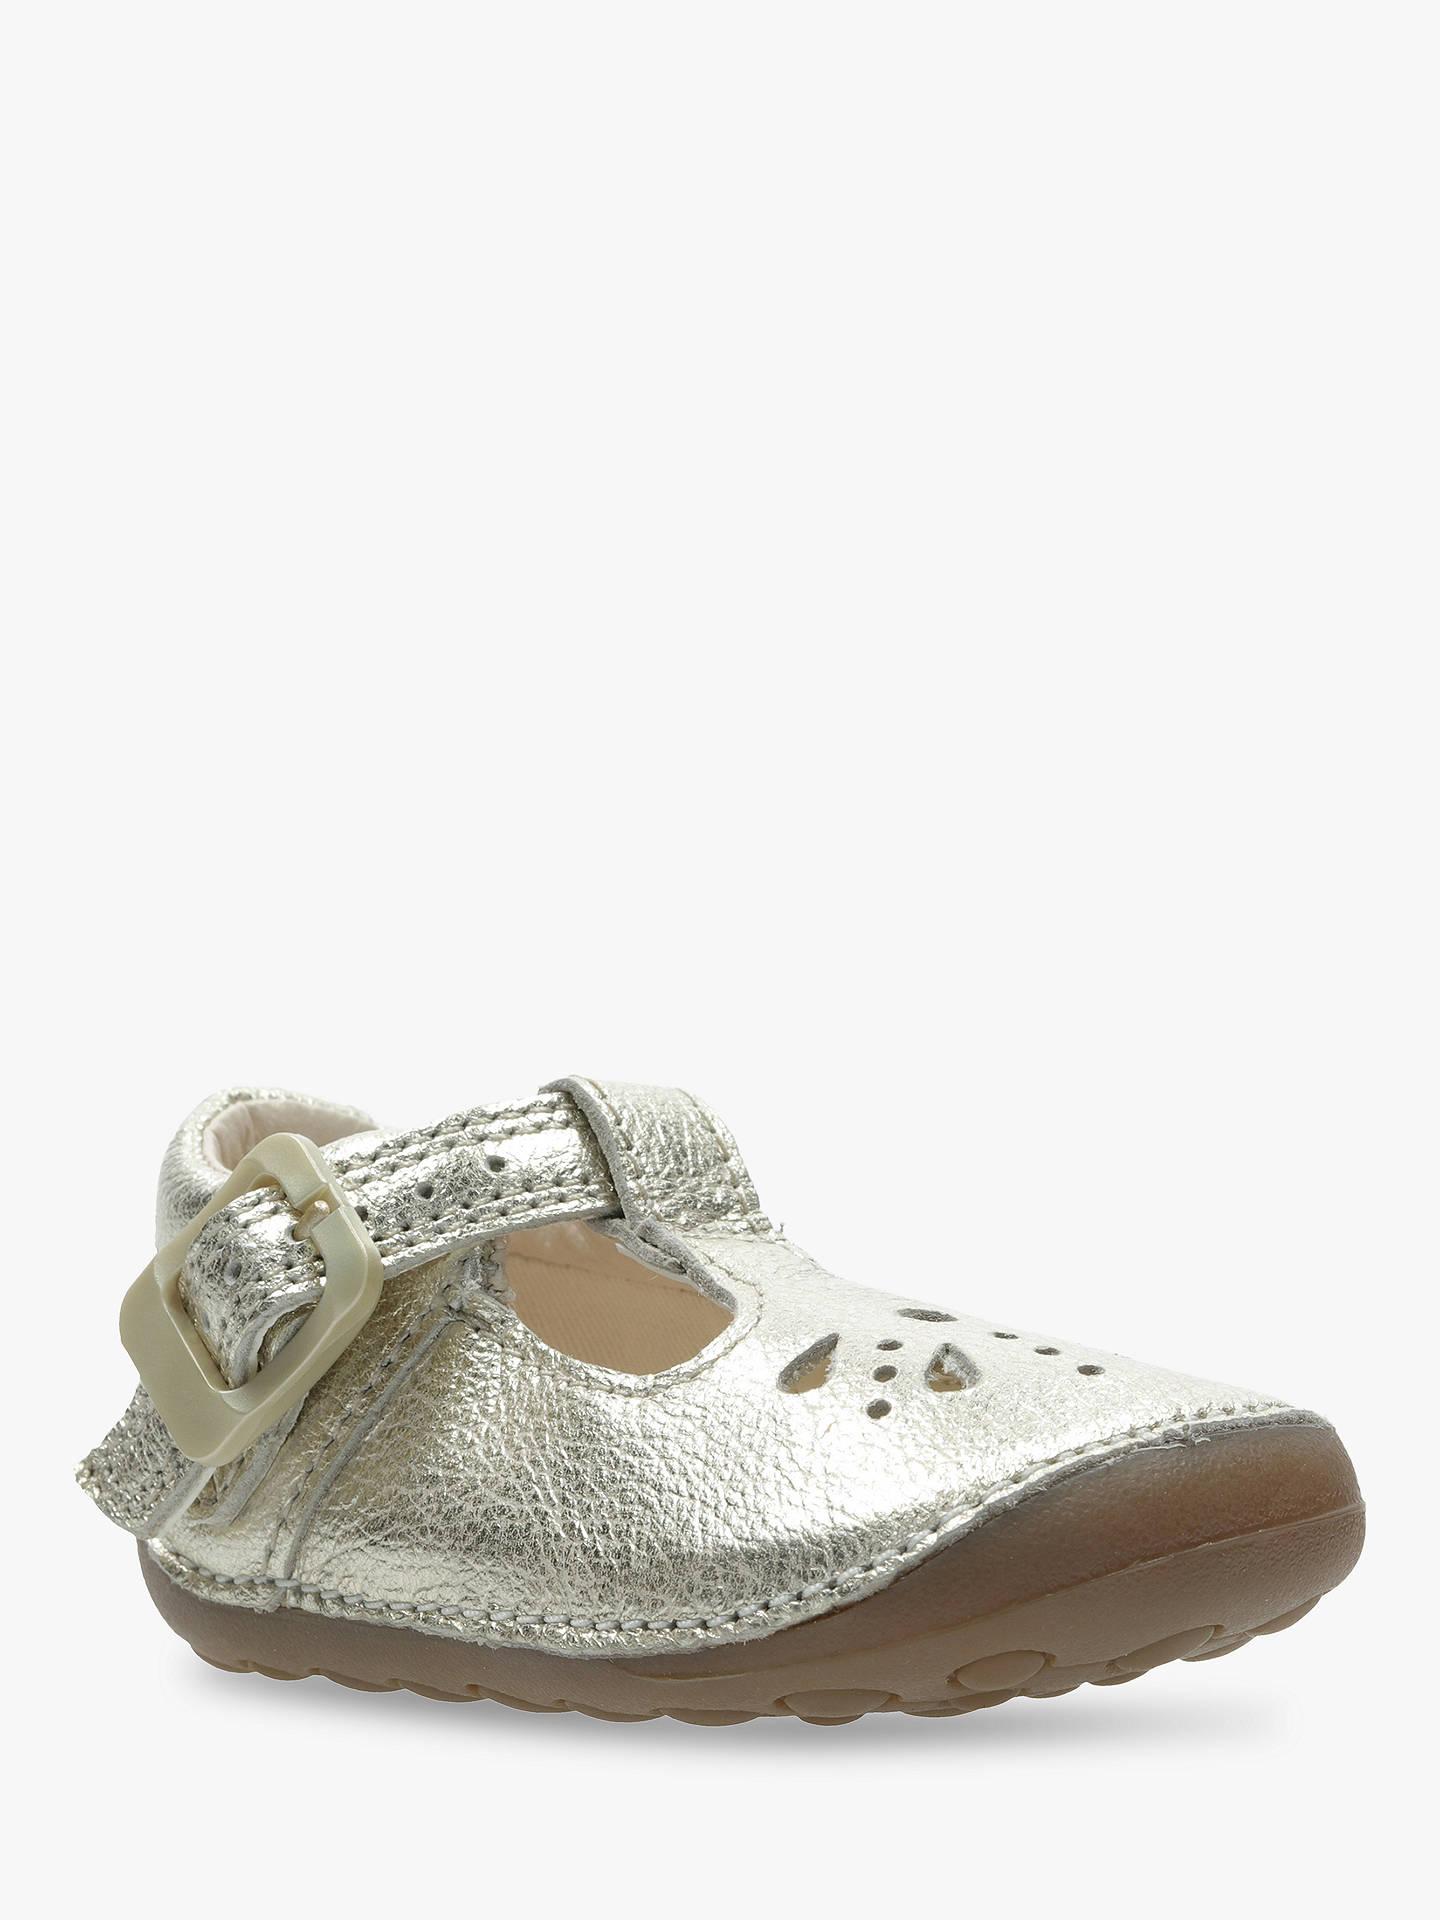 051e3bed2d2b8 ... Buy Clarks Children s Little Weave Pre-Walker Shoes